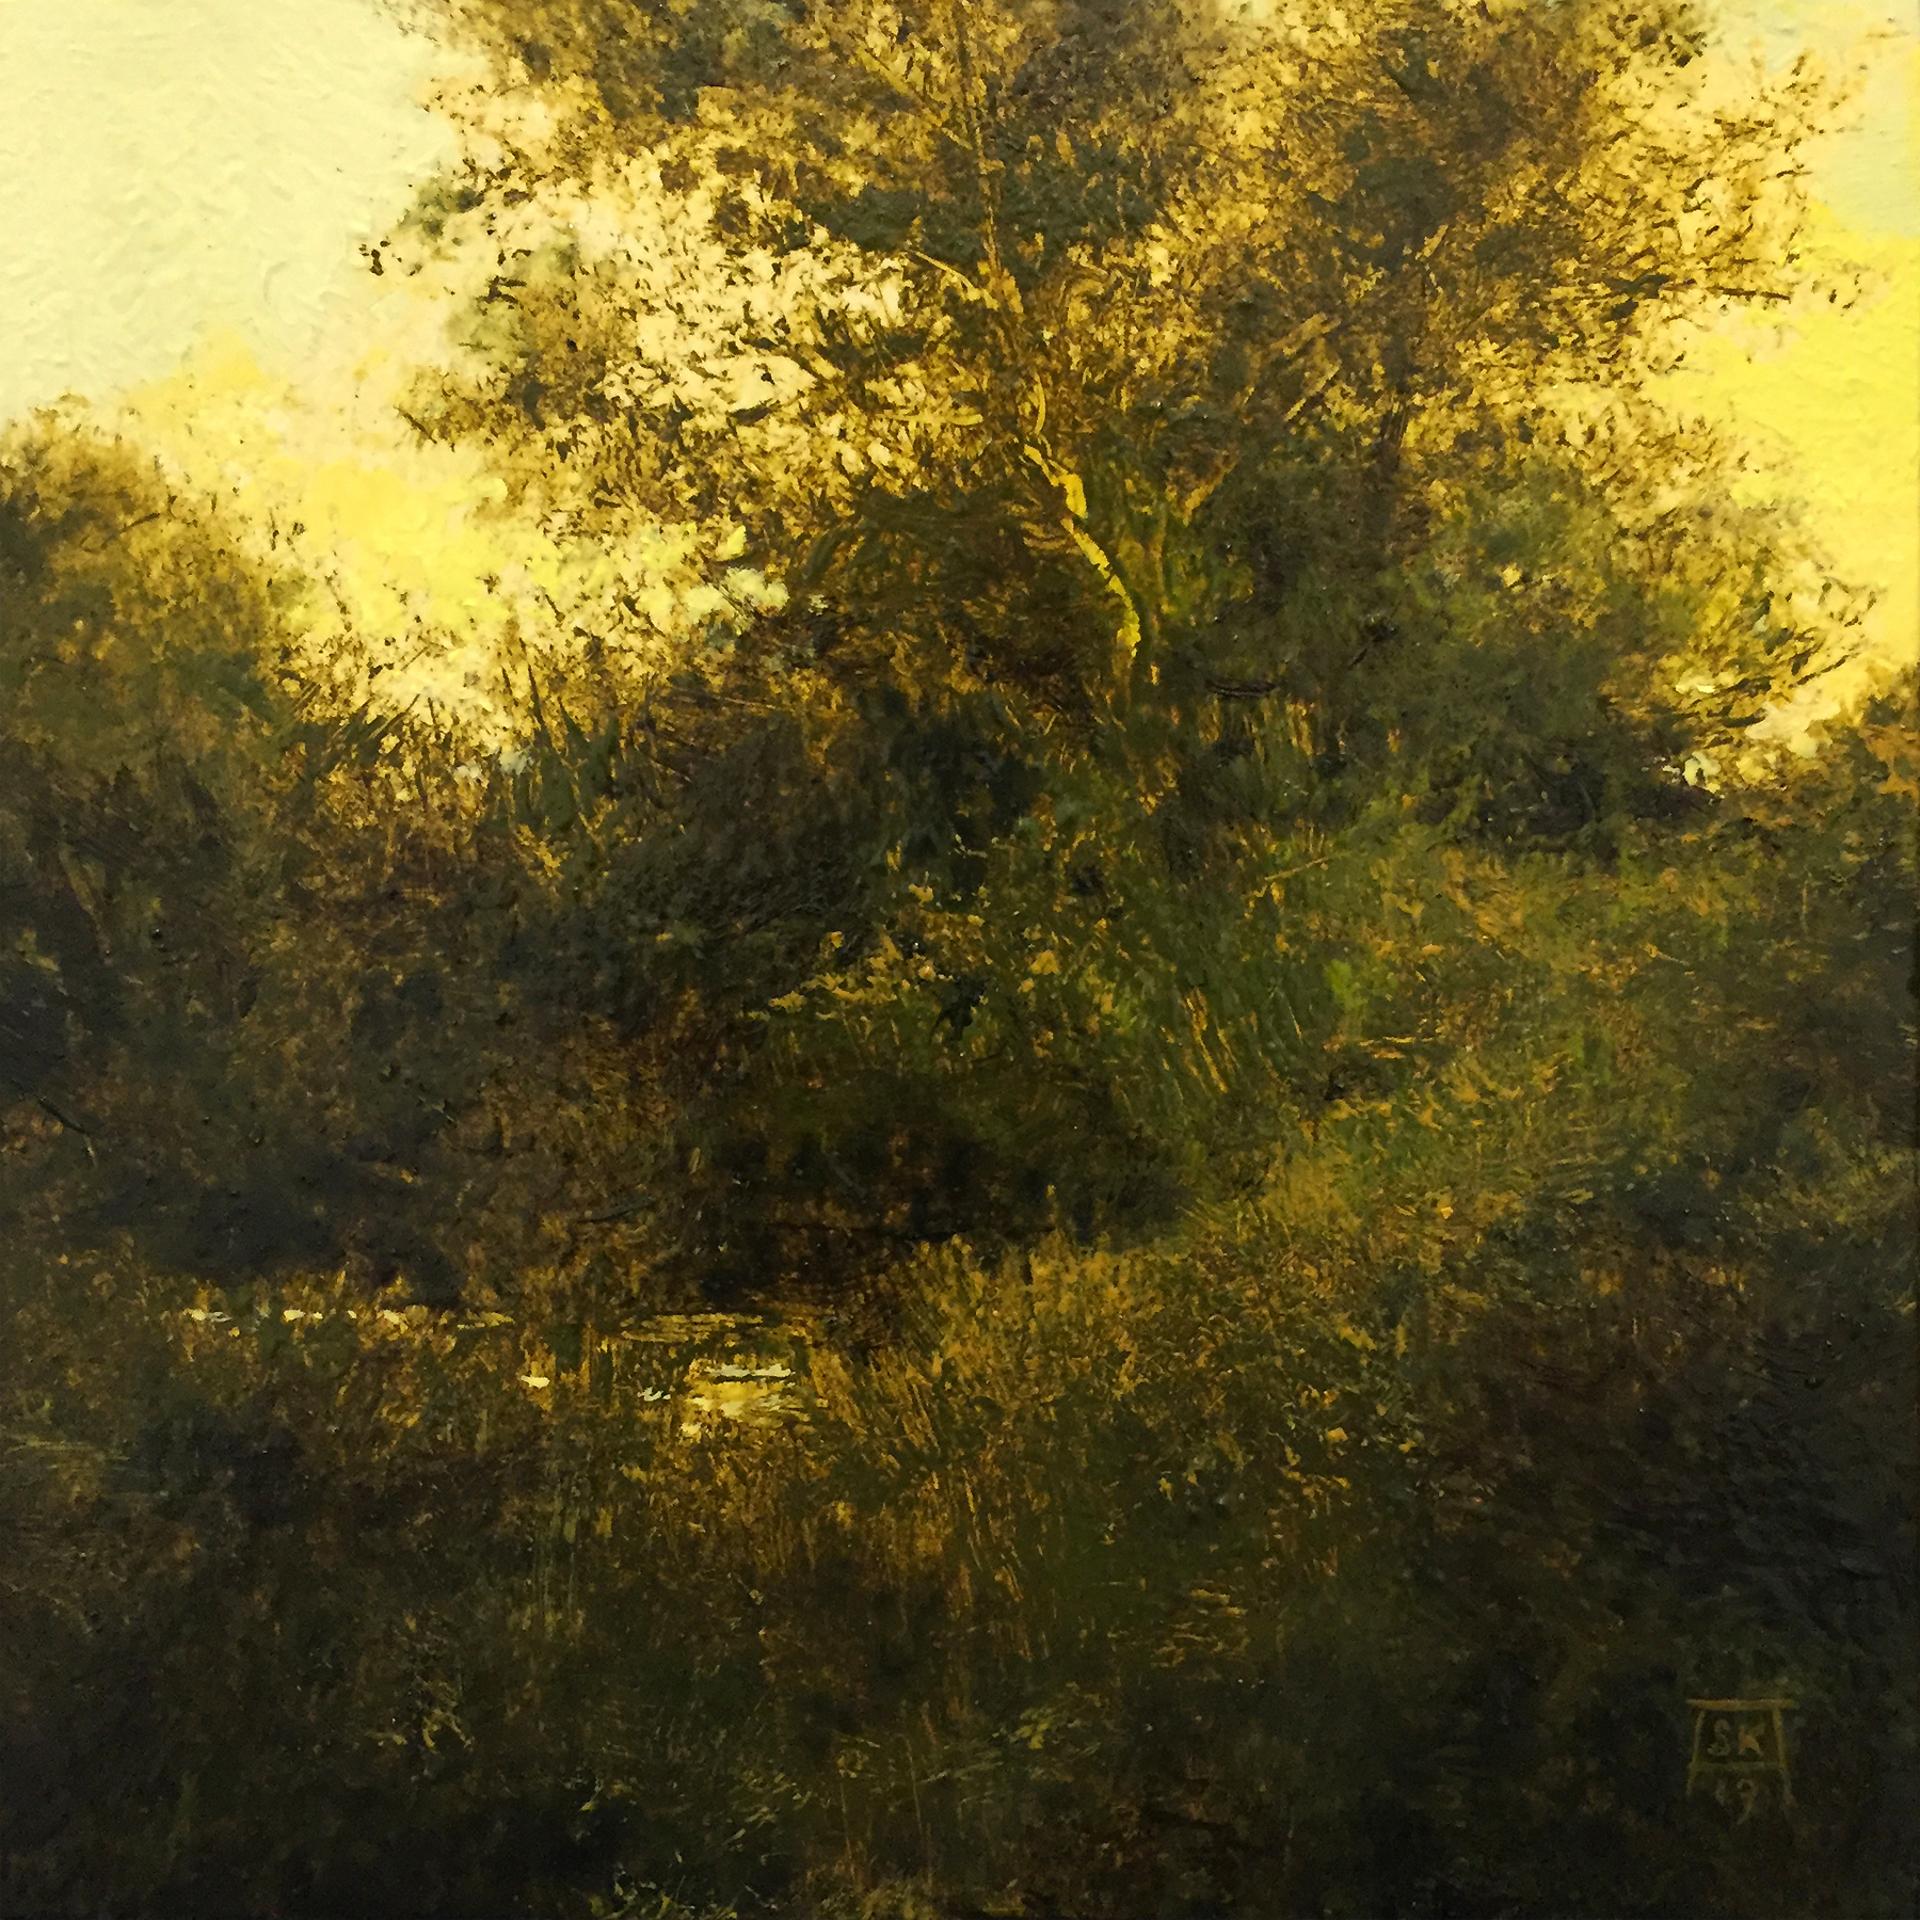 Evening (Ode to H. D. Martin) by Shawn Krueger